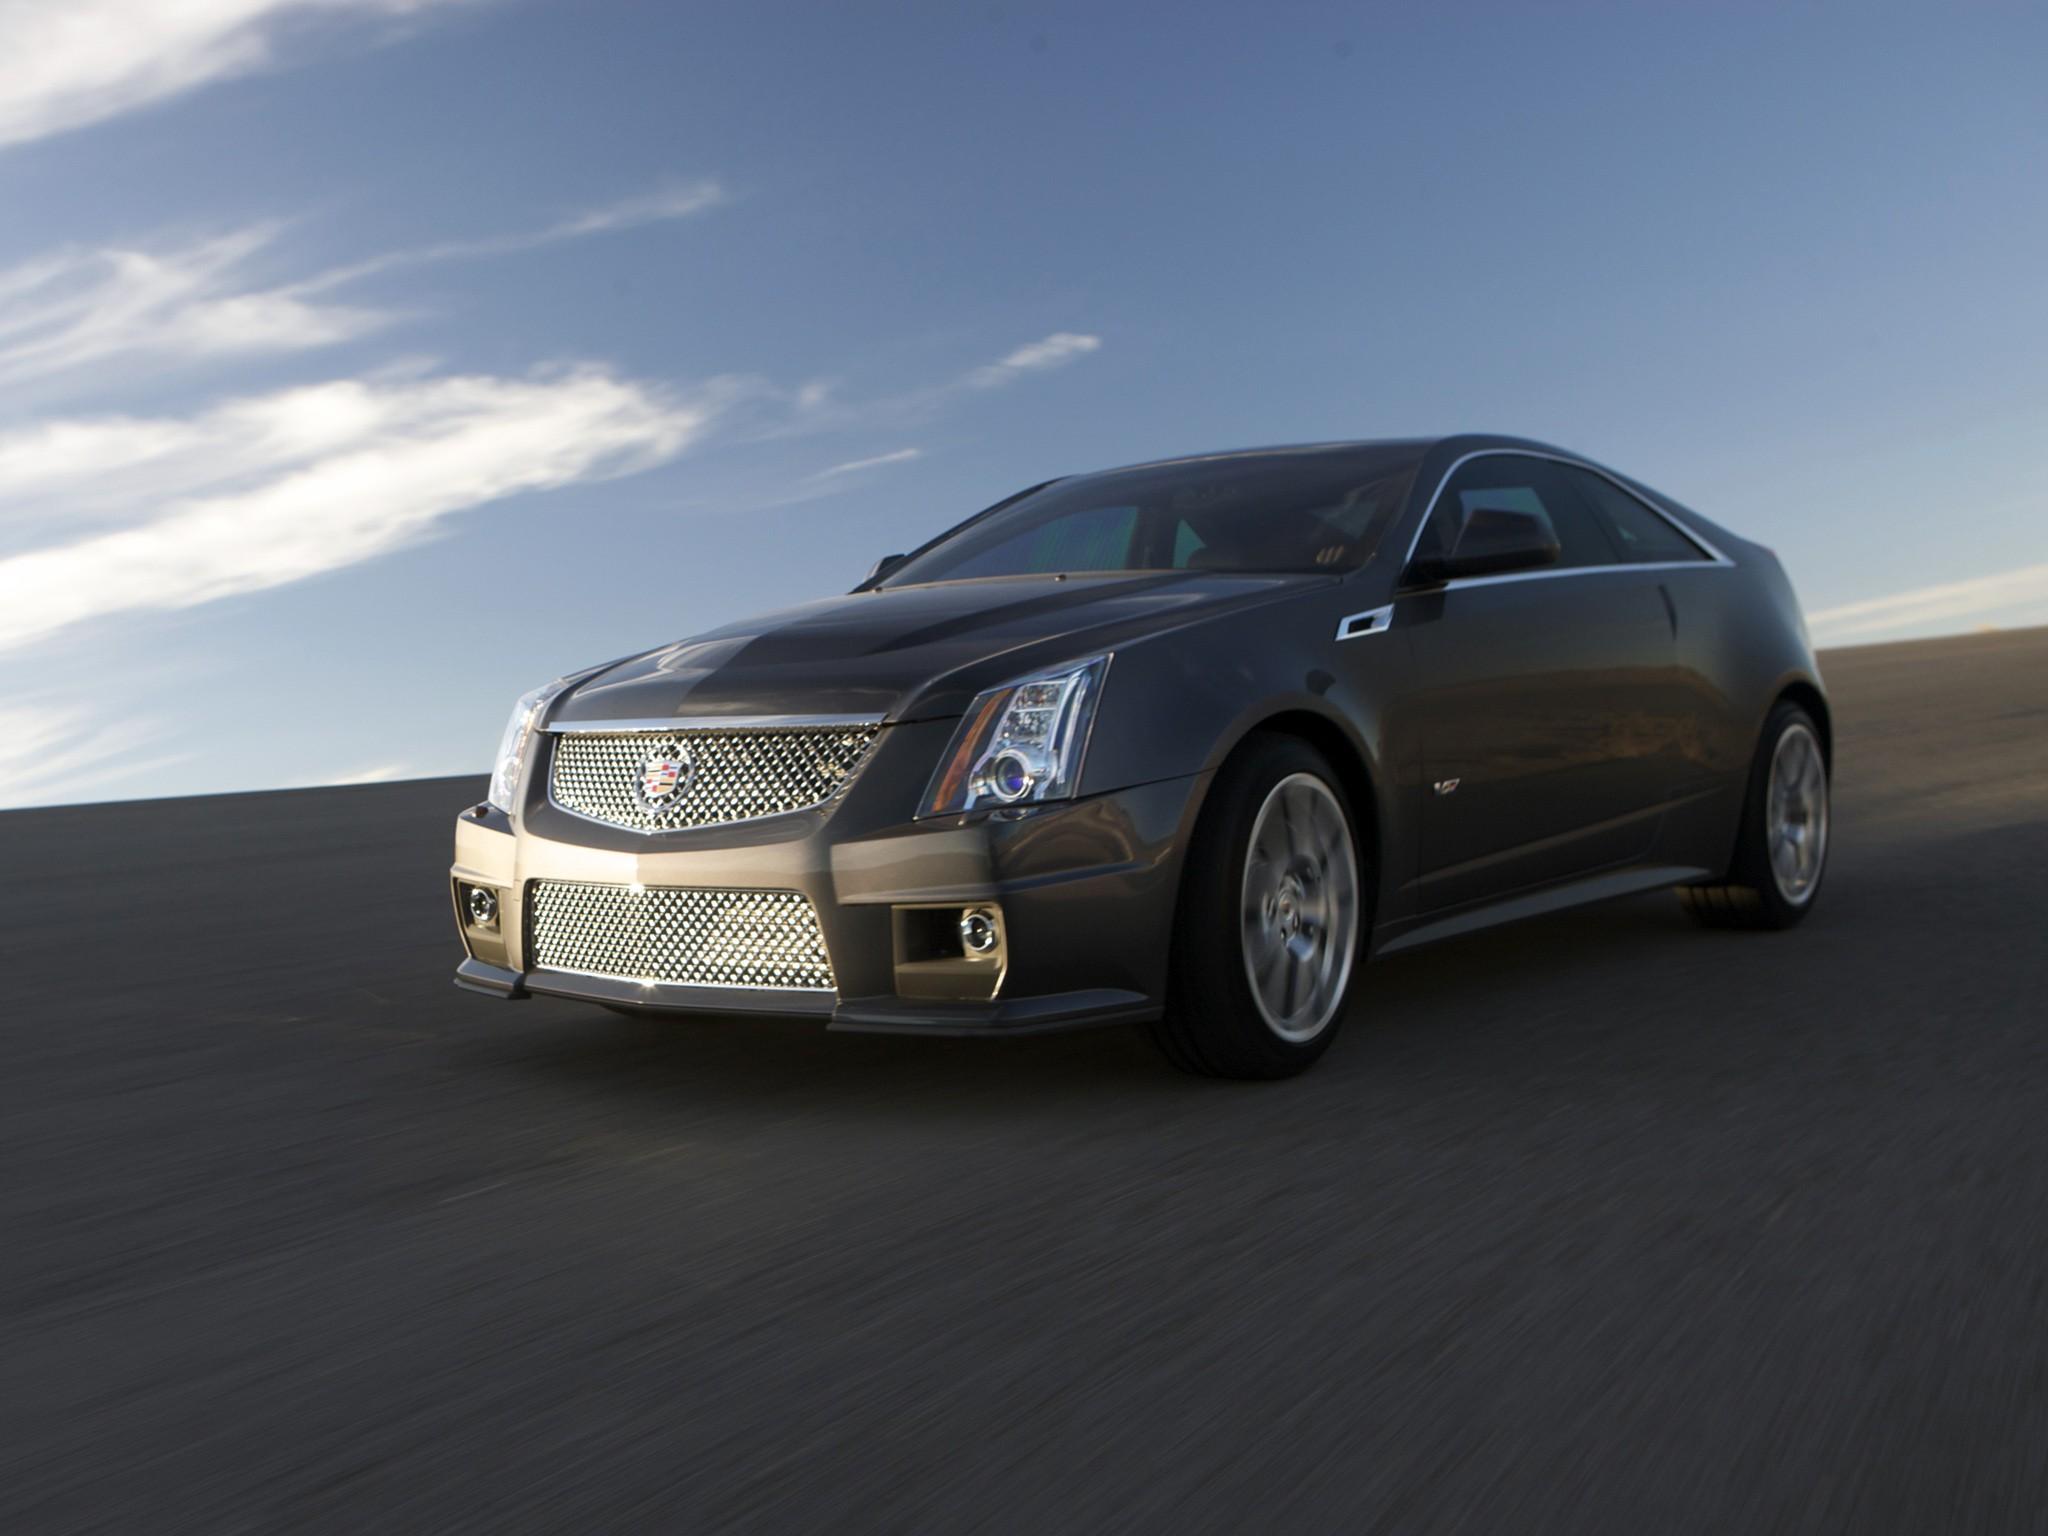 Cadillac cts v coupe specs photos 2012 2013 2014 - Cadillac cts v coupe specs ...